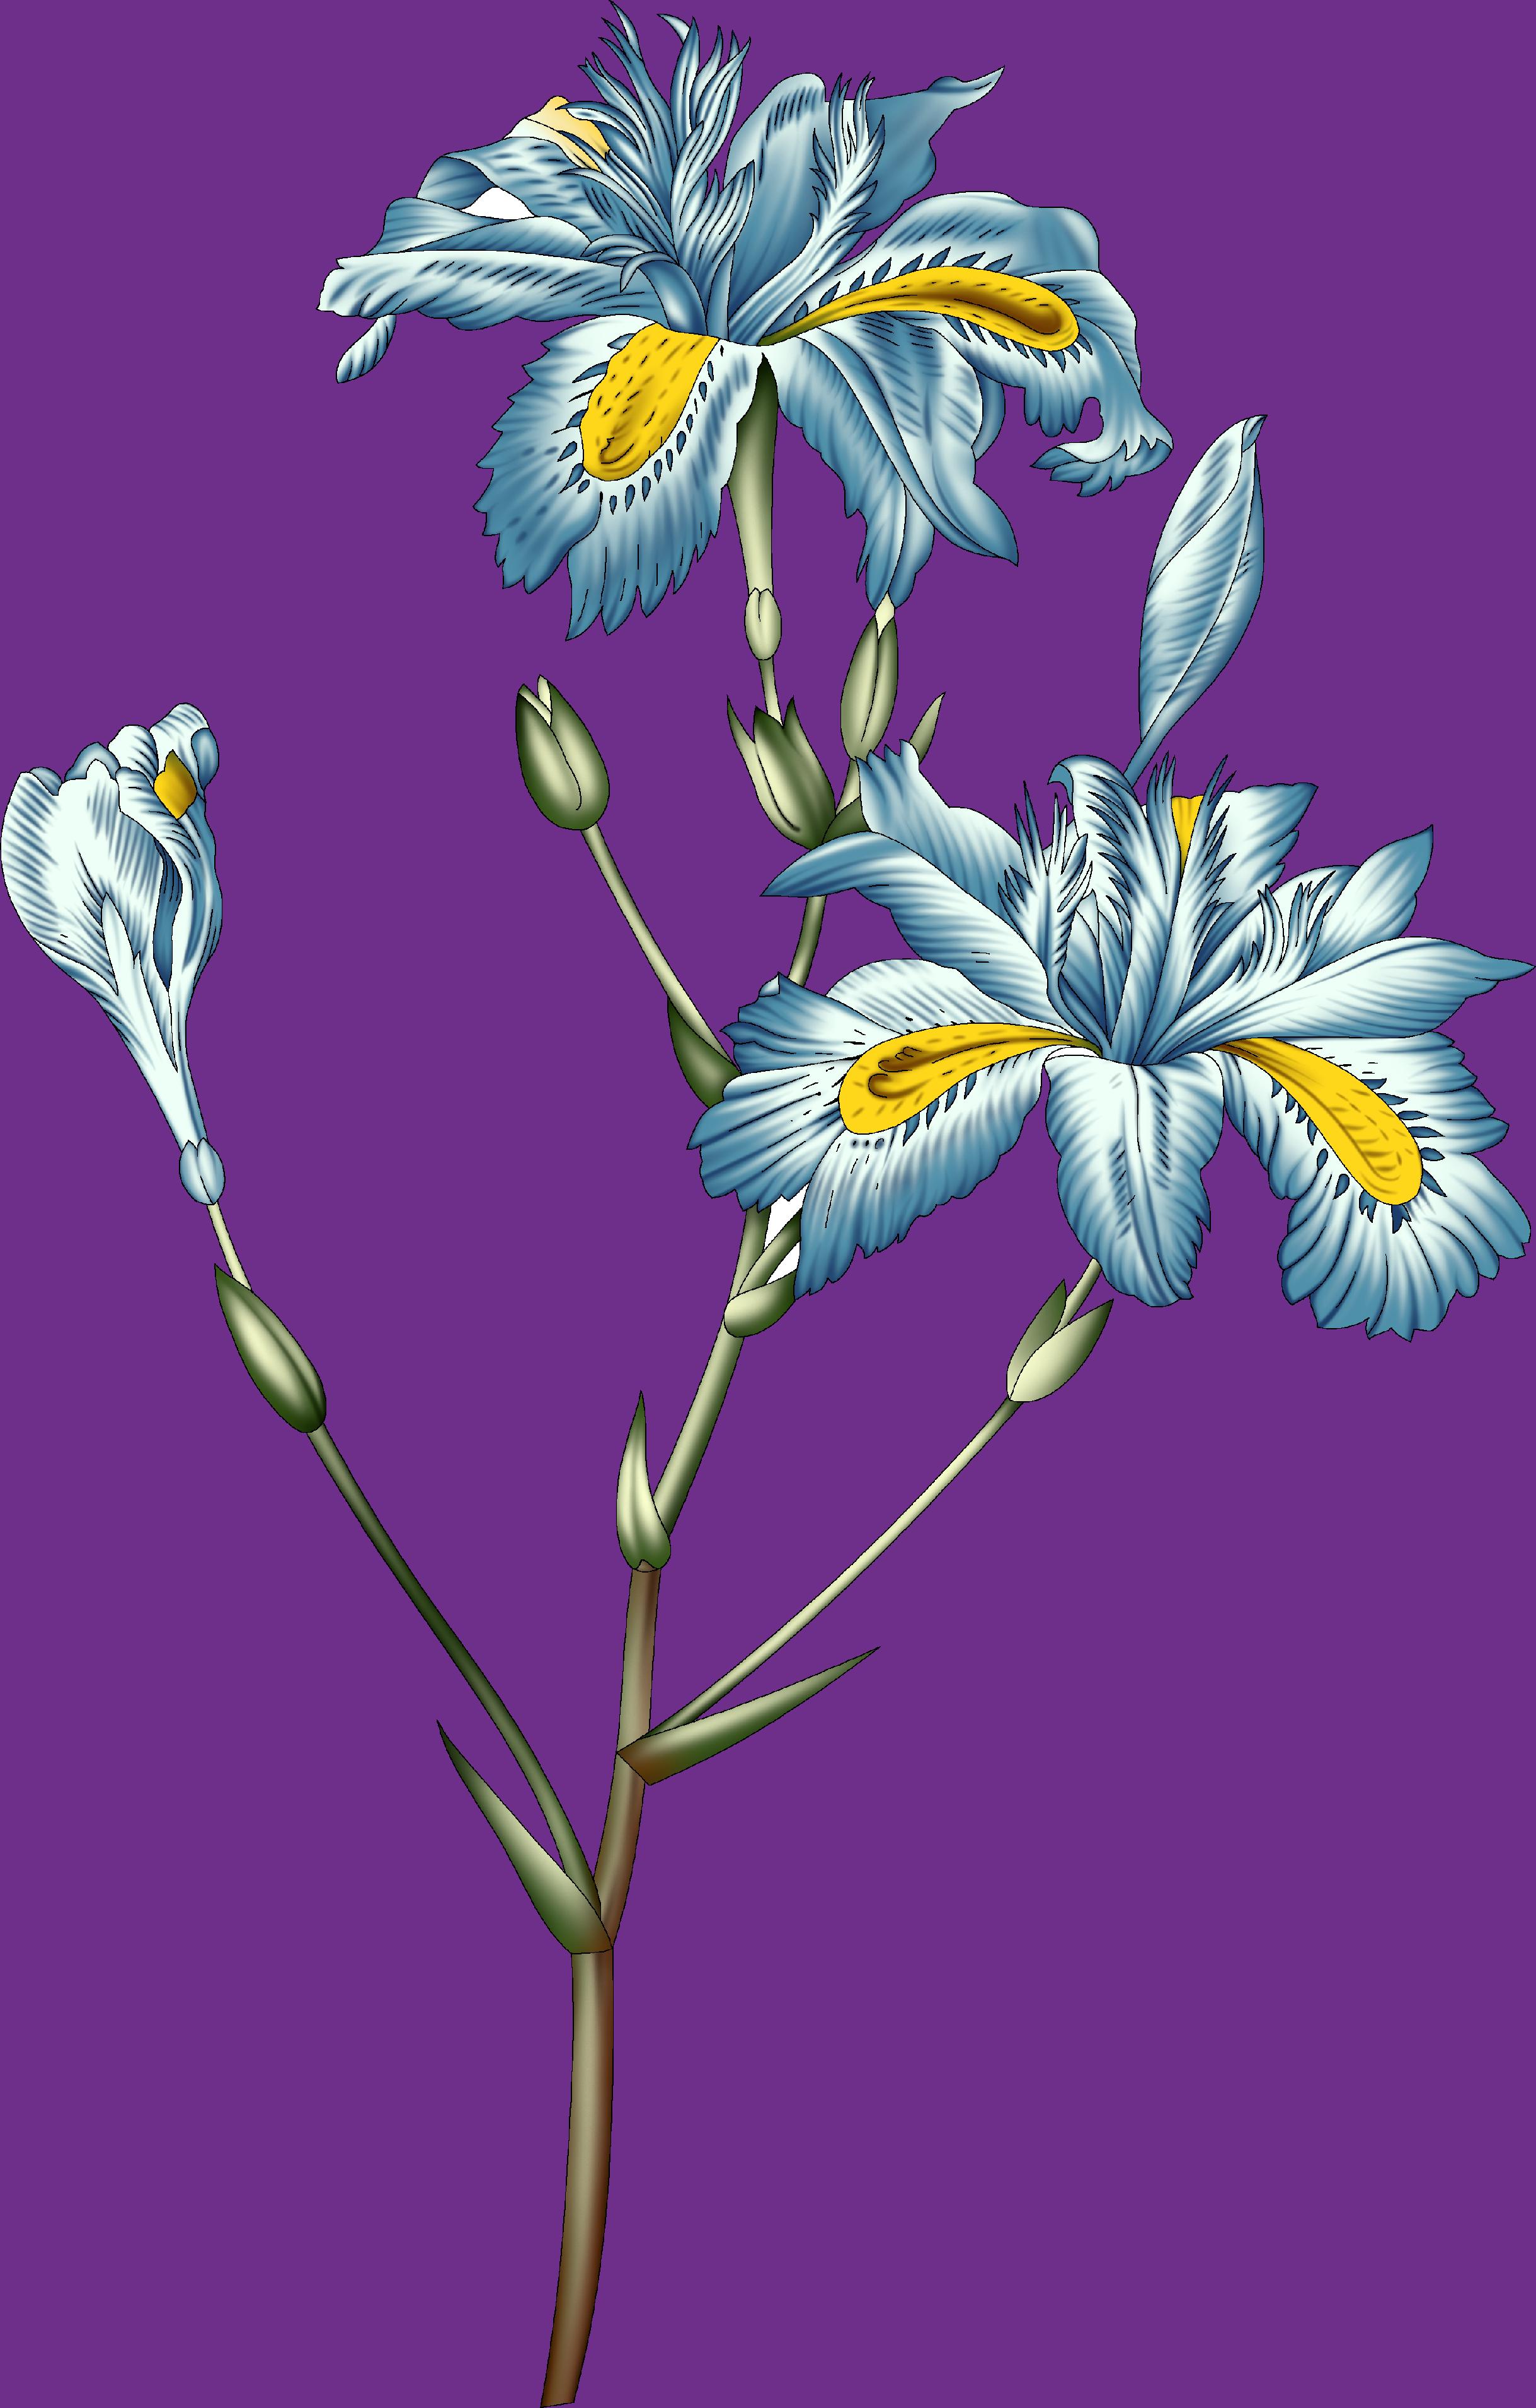 Pin By Hummaira Ali On Flower In 2020 Abstract Flowers Digital Flowers Flower Art